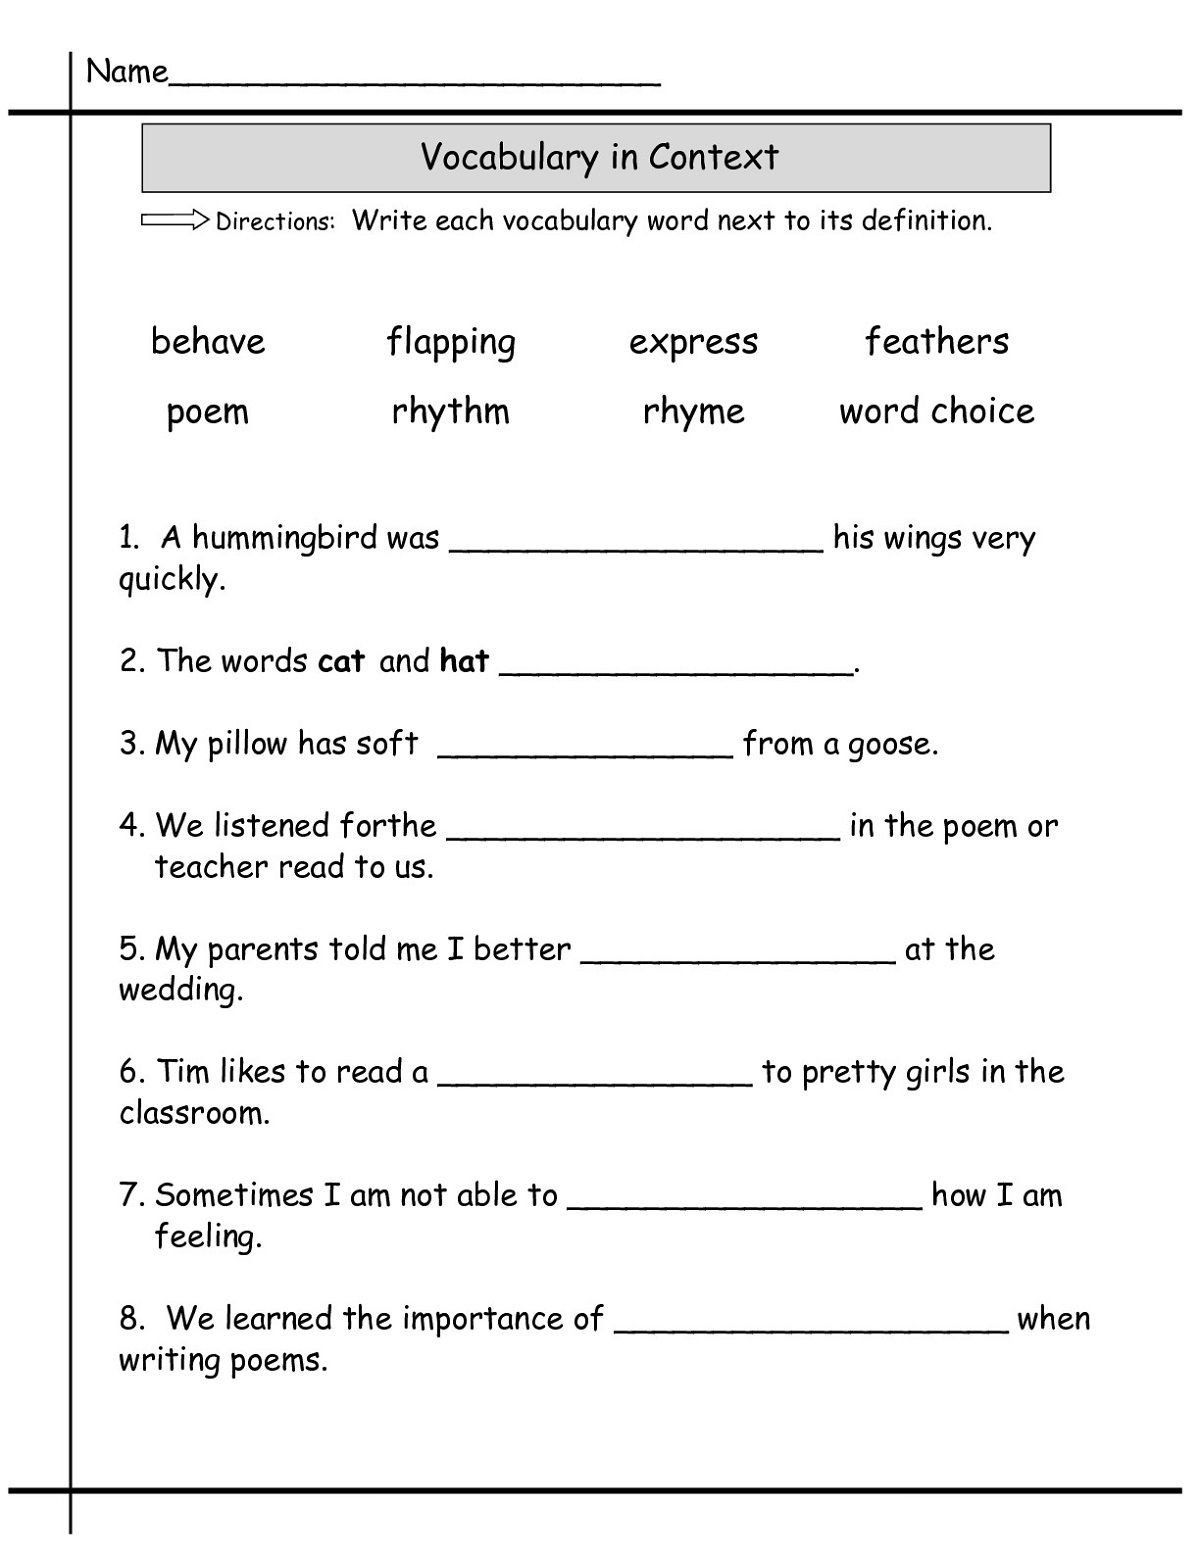 8th Grade Vocabulary Worksheets Antonym Worksheet For 3rd